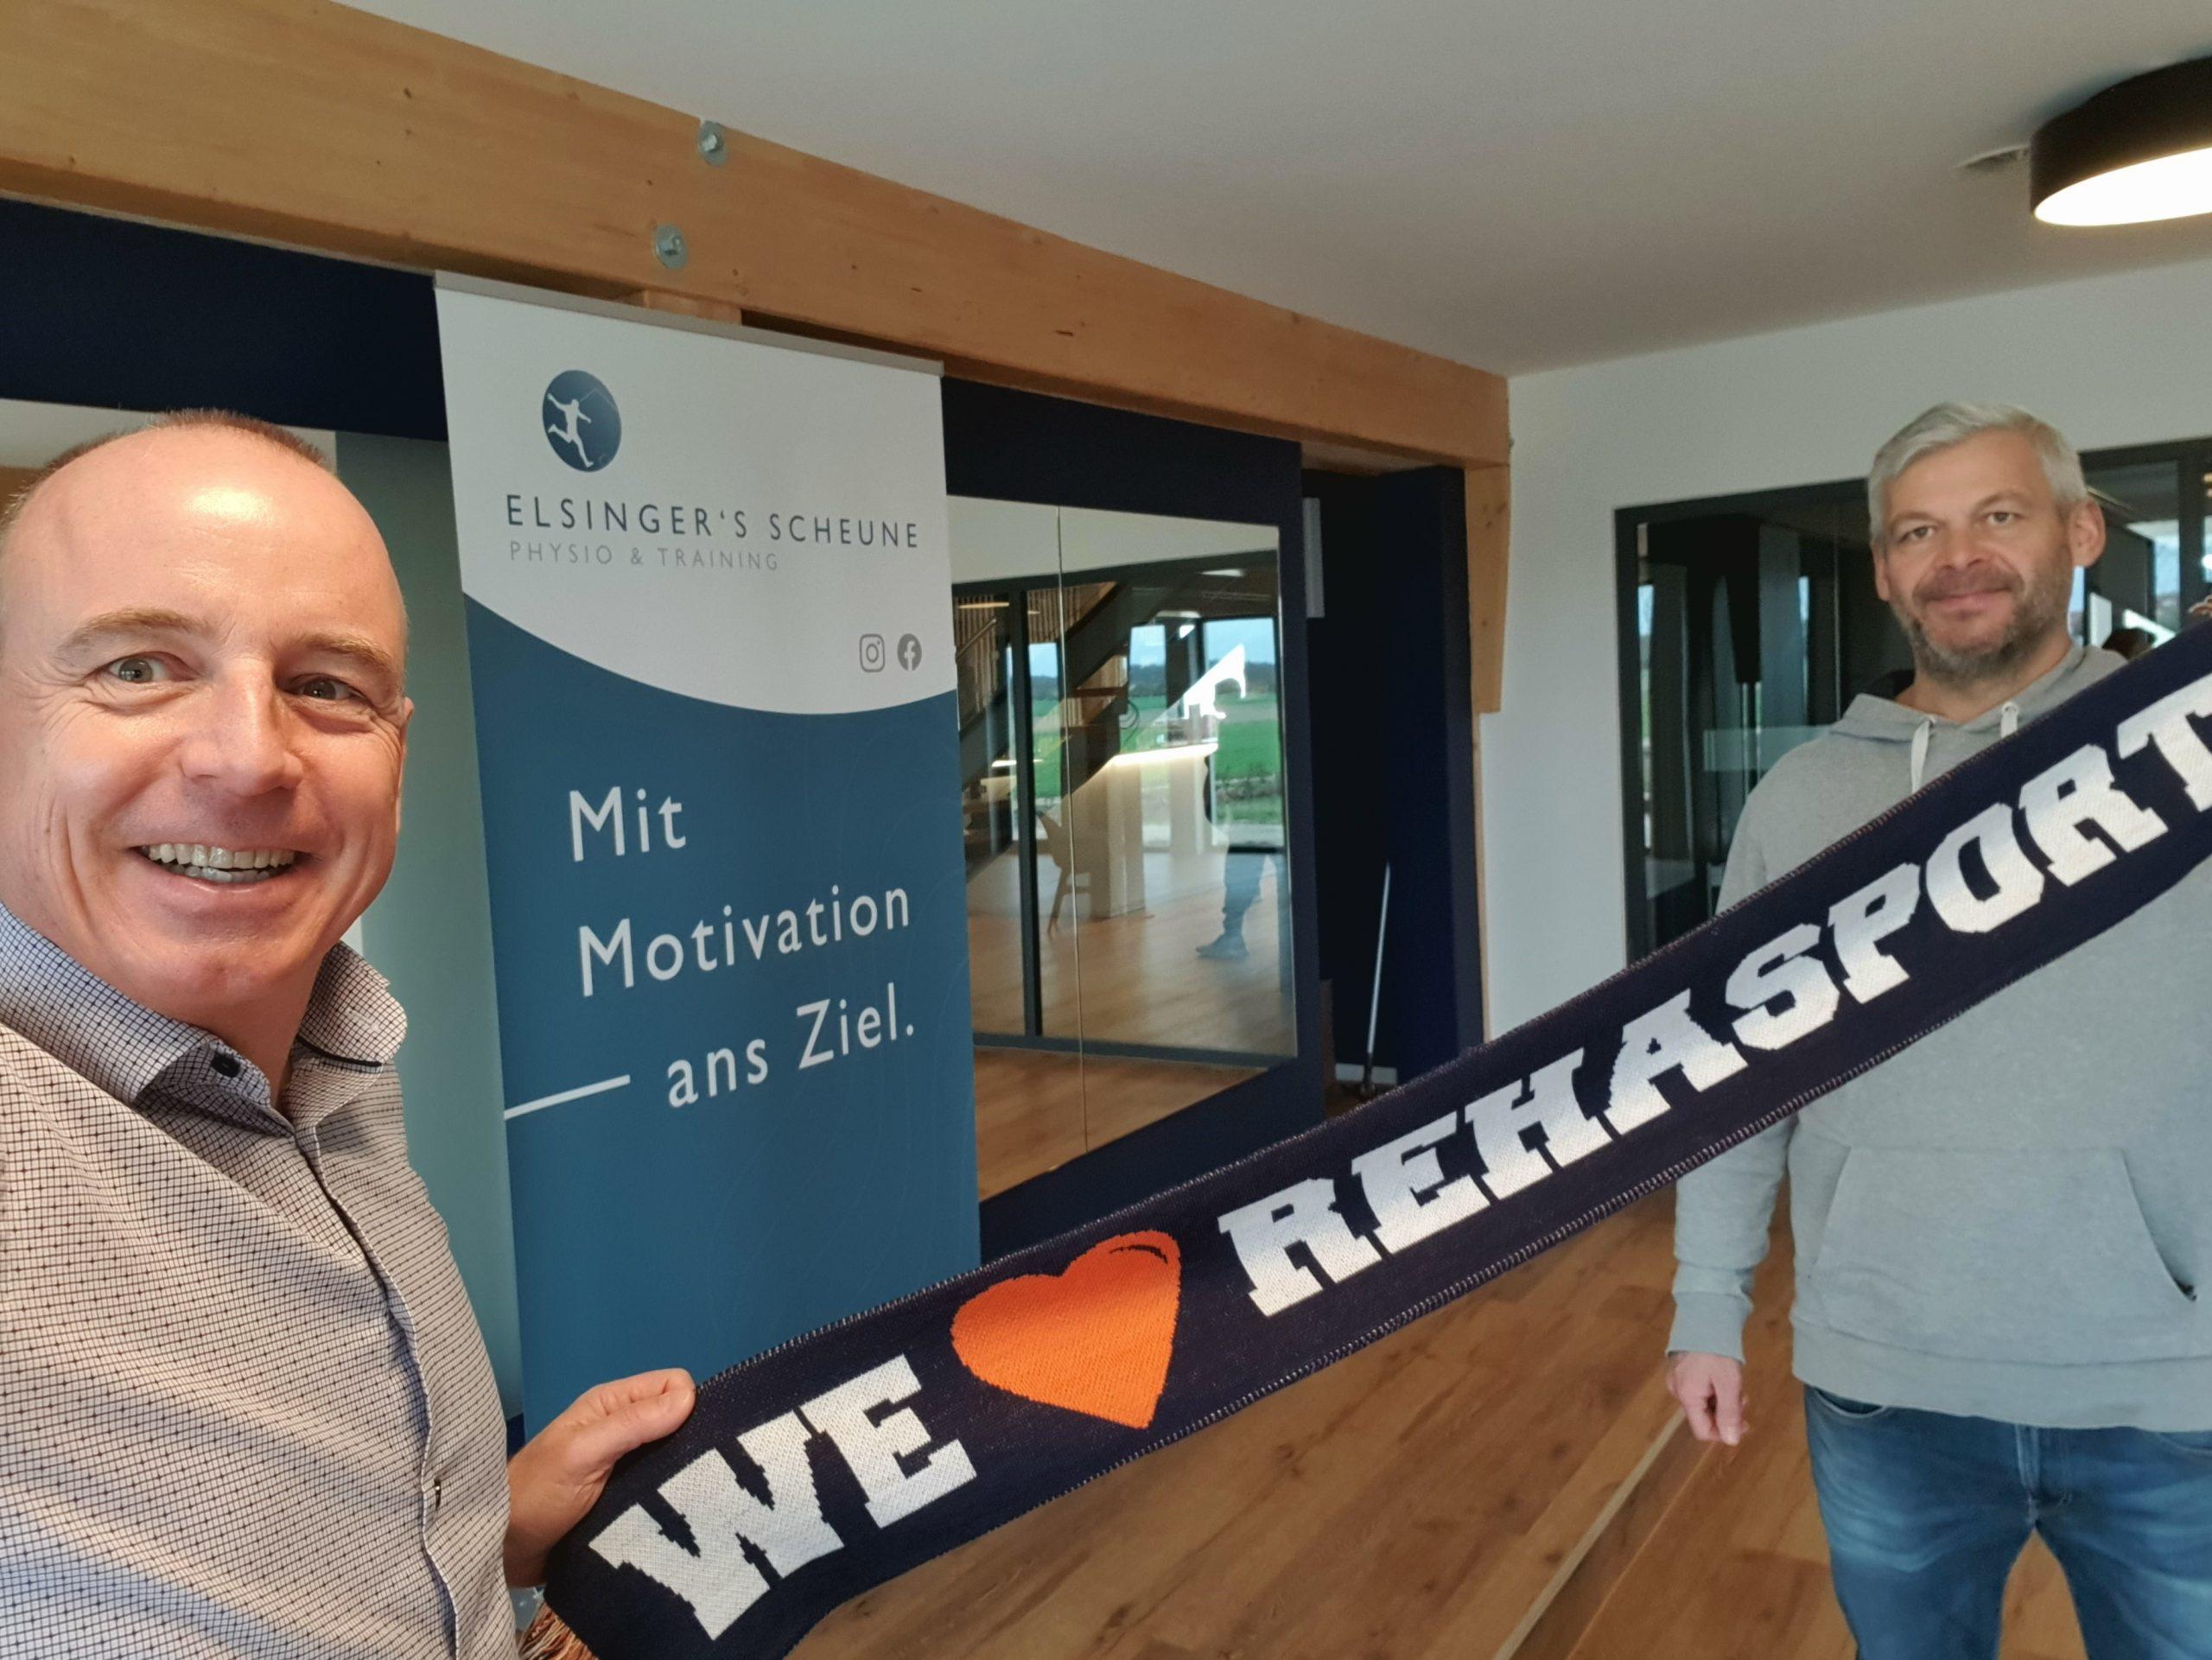 Rehasport in Groß-Gerau - Elsinger's Scheune GmbH & Co. KG